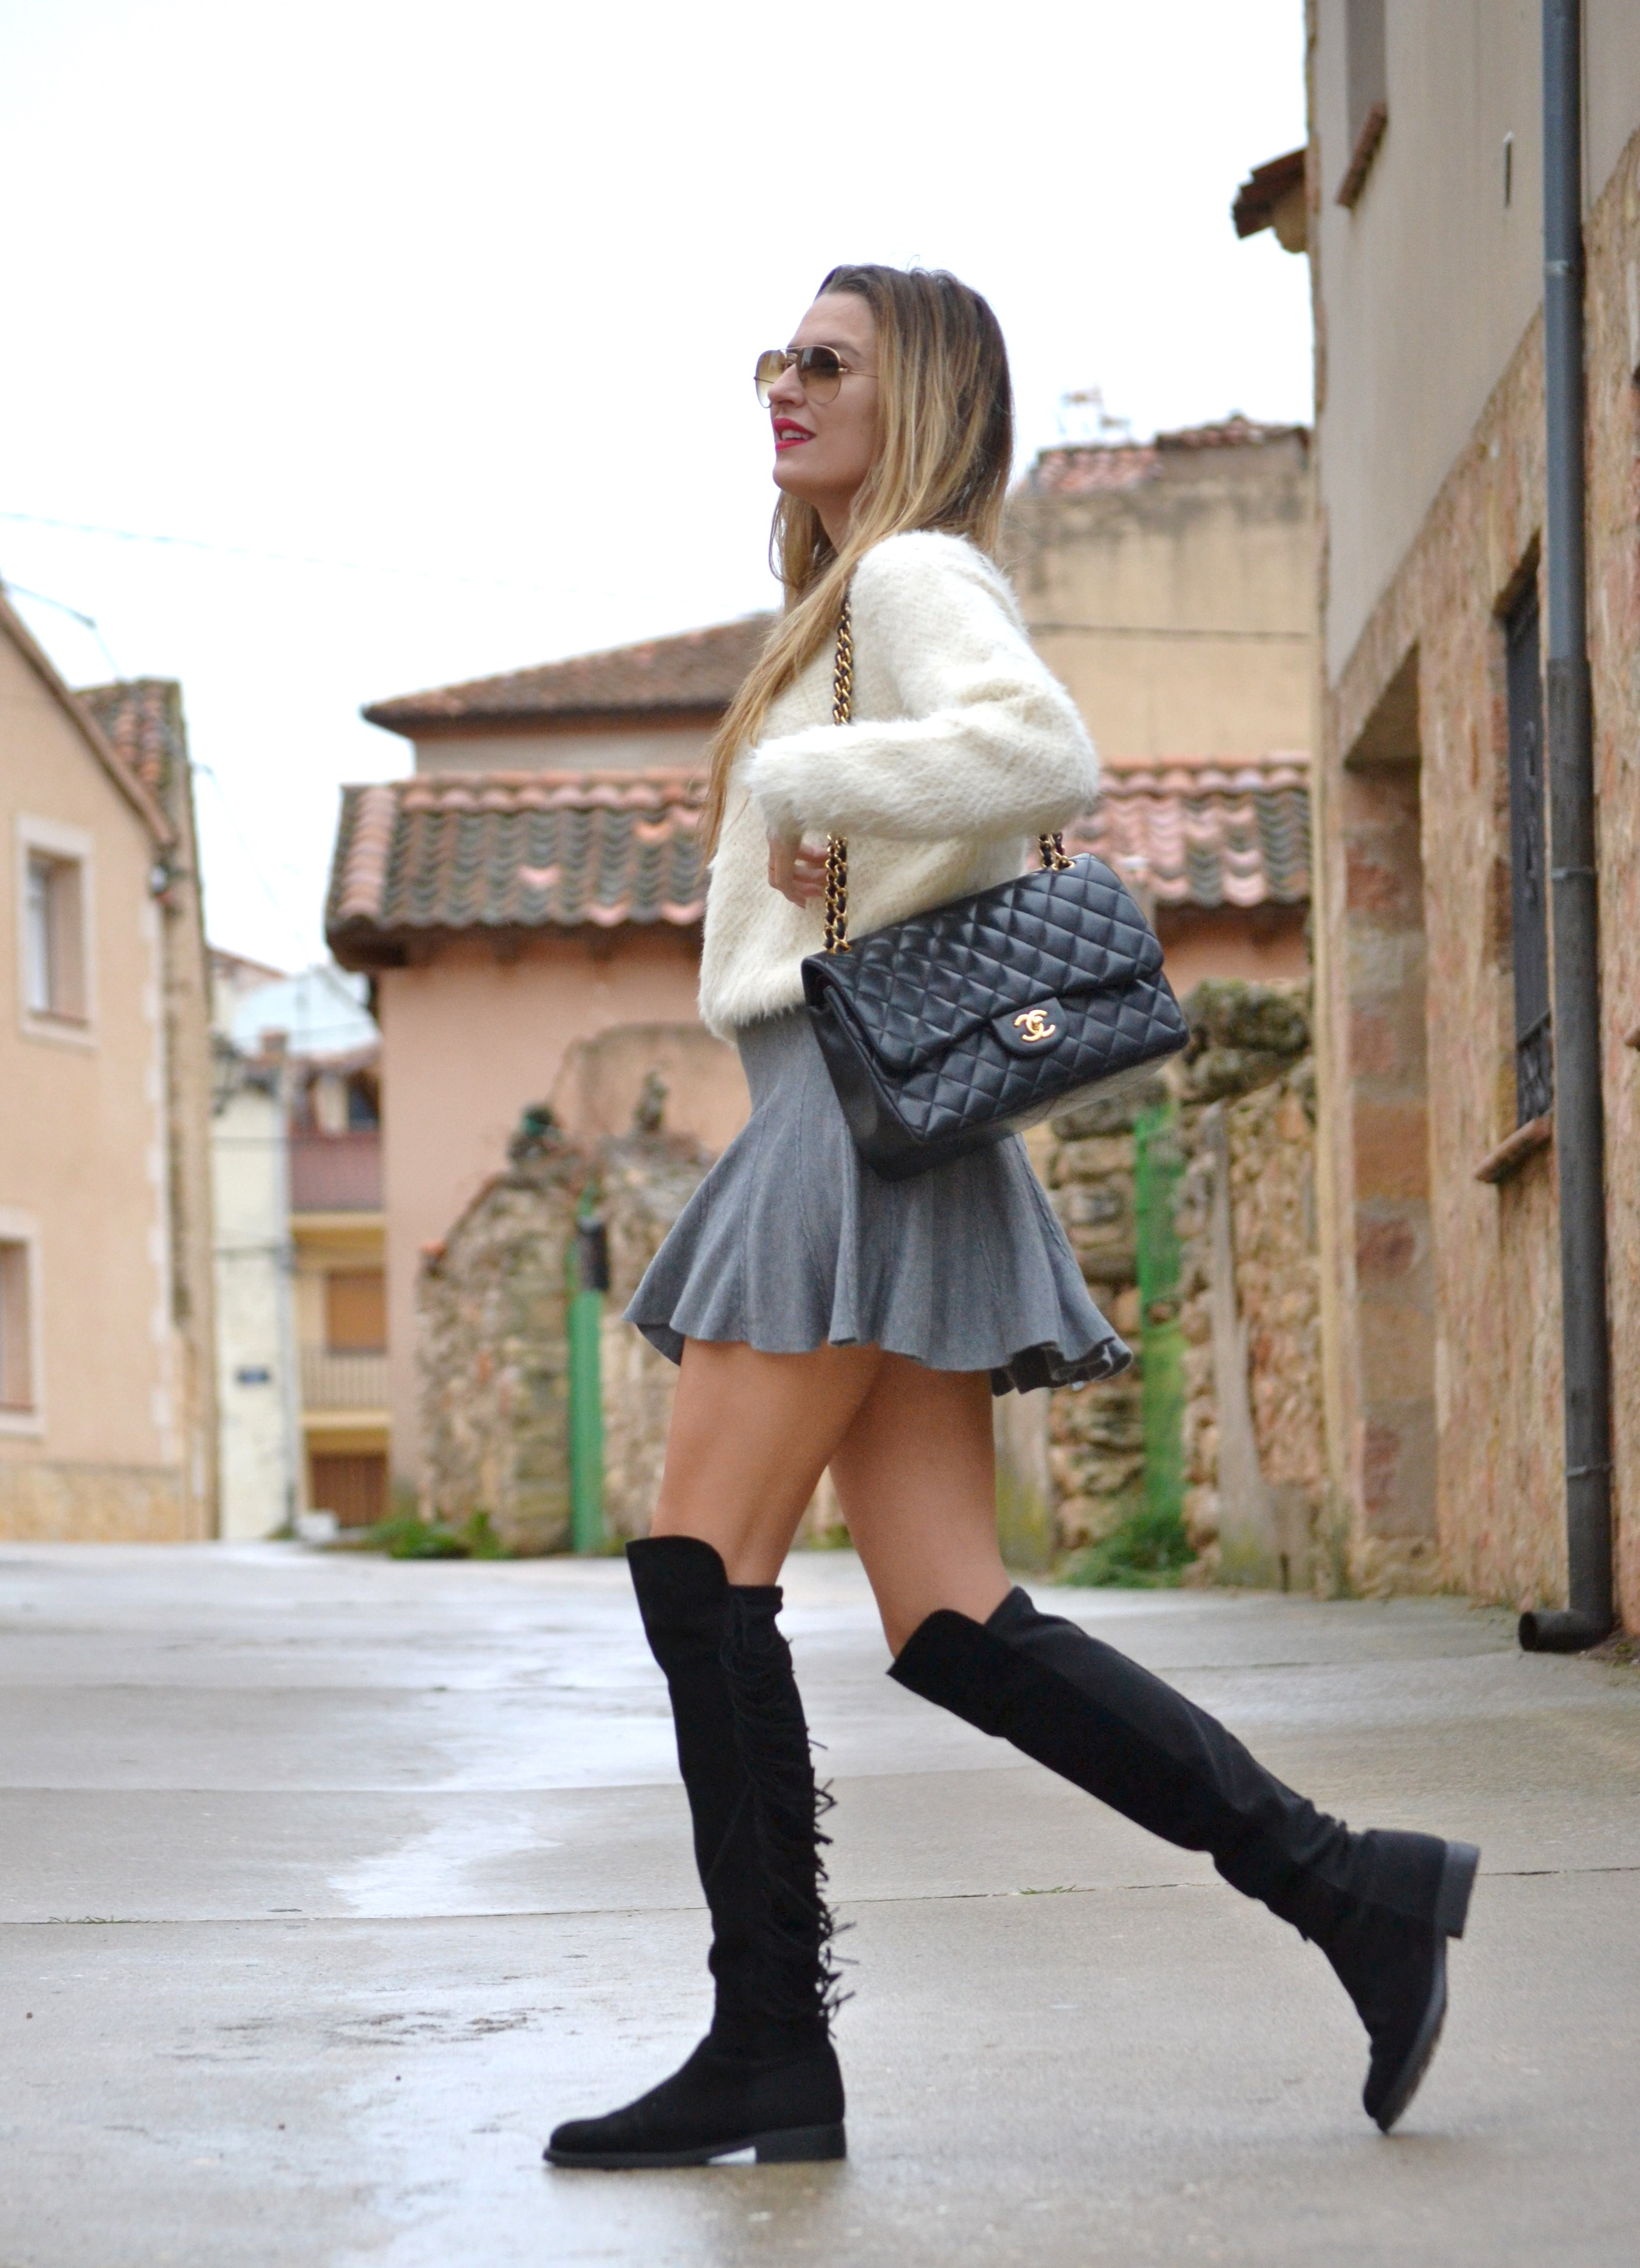 Over_The_Knee_Boots_Lara_Martin_Gilarranz_Bymyheels_Skirt_Ray_Ban_Jumbo_Chanel_Pilar_Burgos (15)